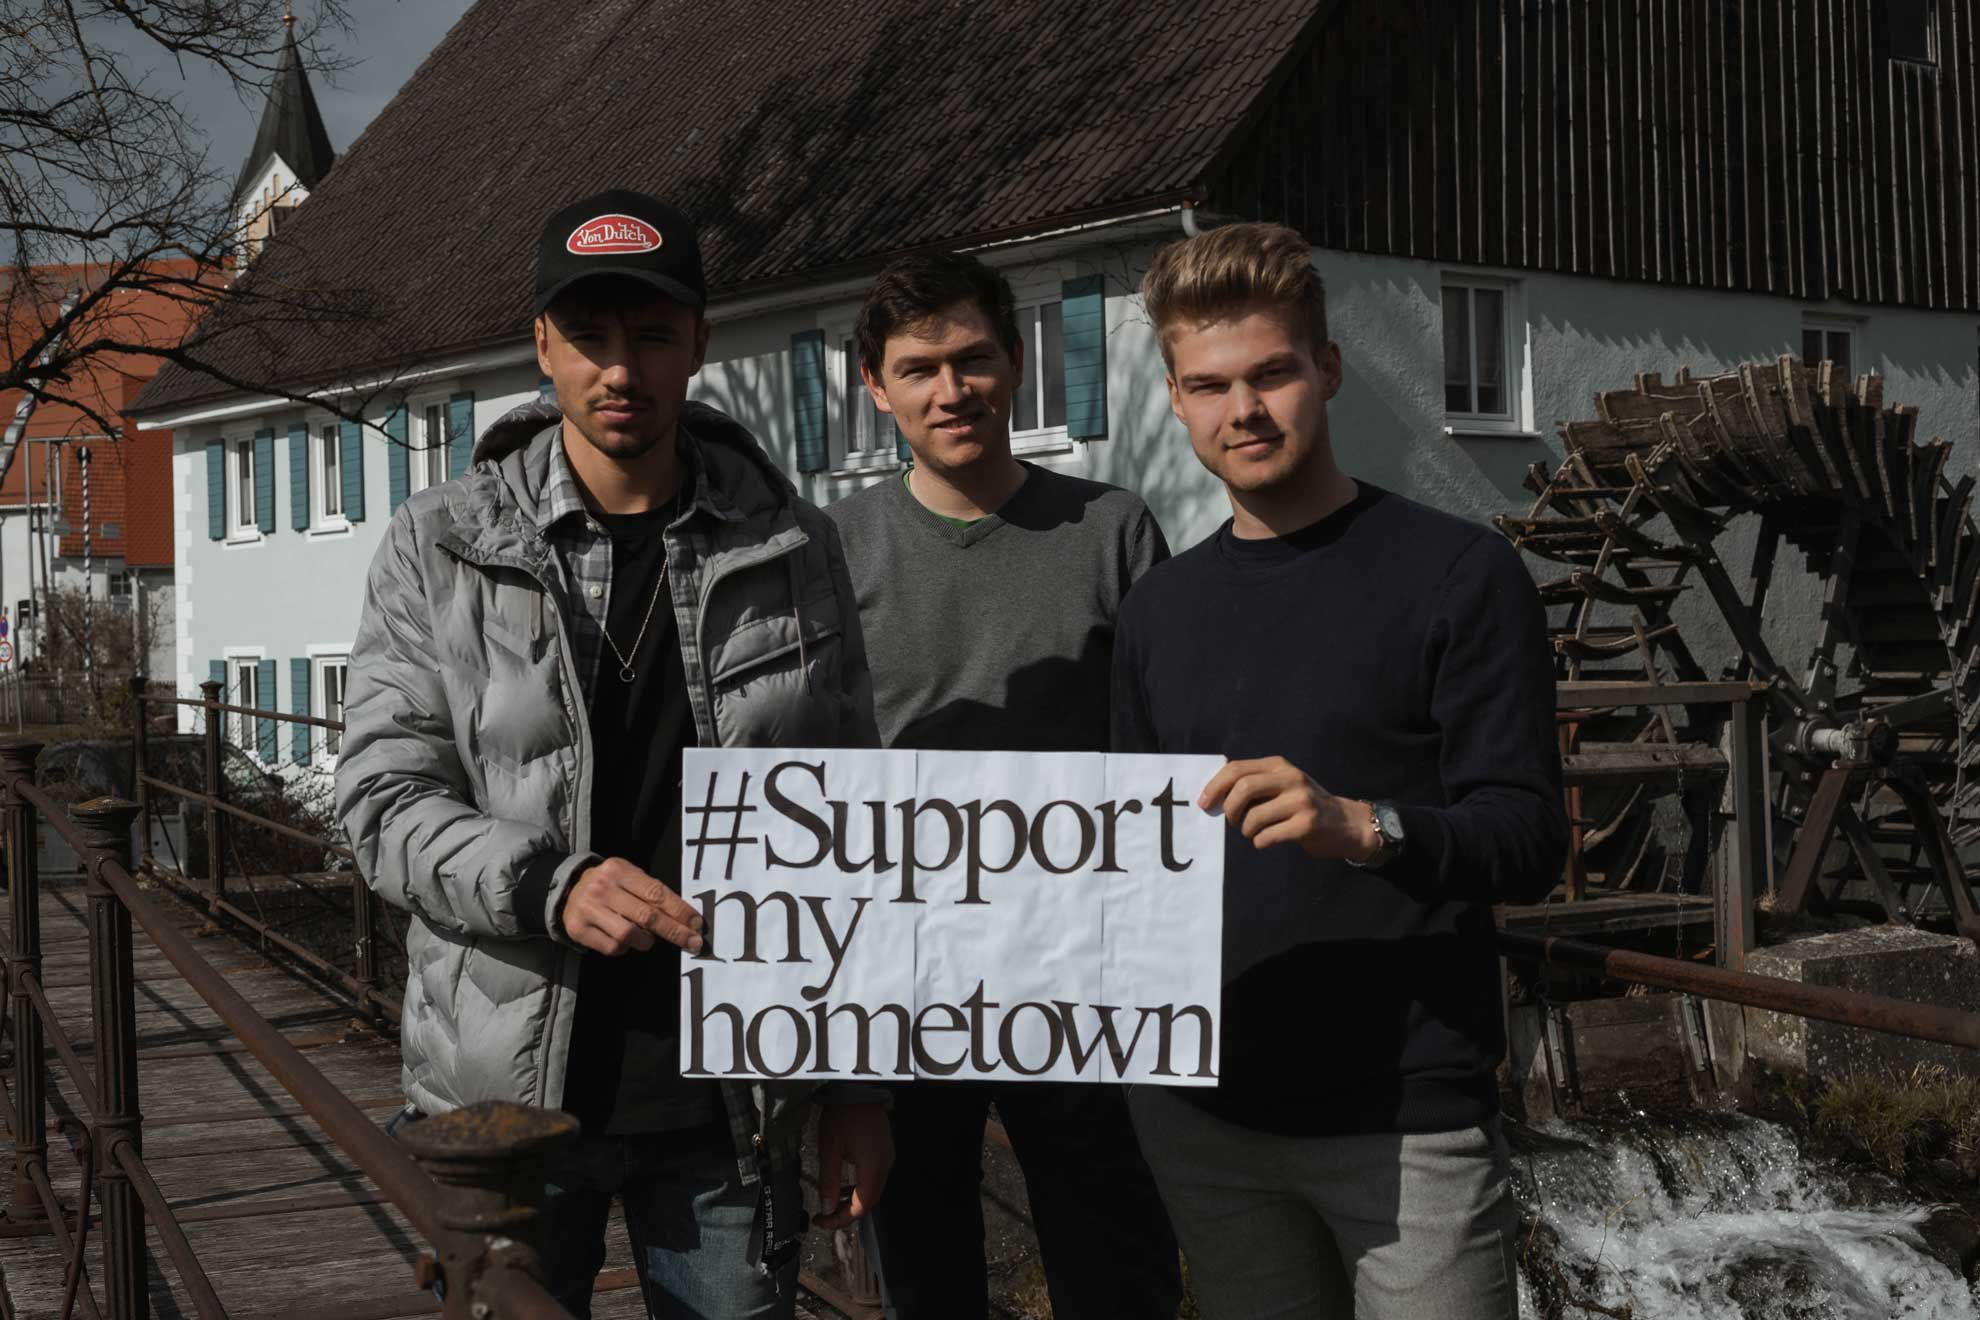 Gründer von Support My Hometown v.l. Maximilian Vihl, Max Gartner, Tizian Fendt